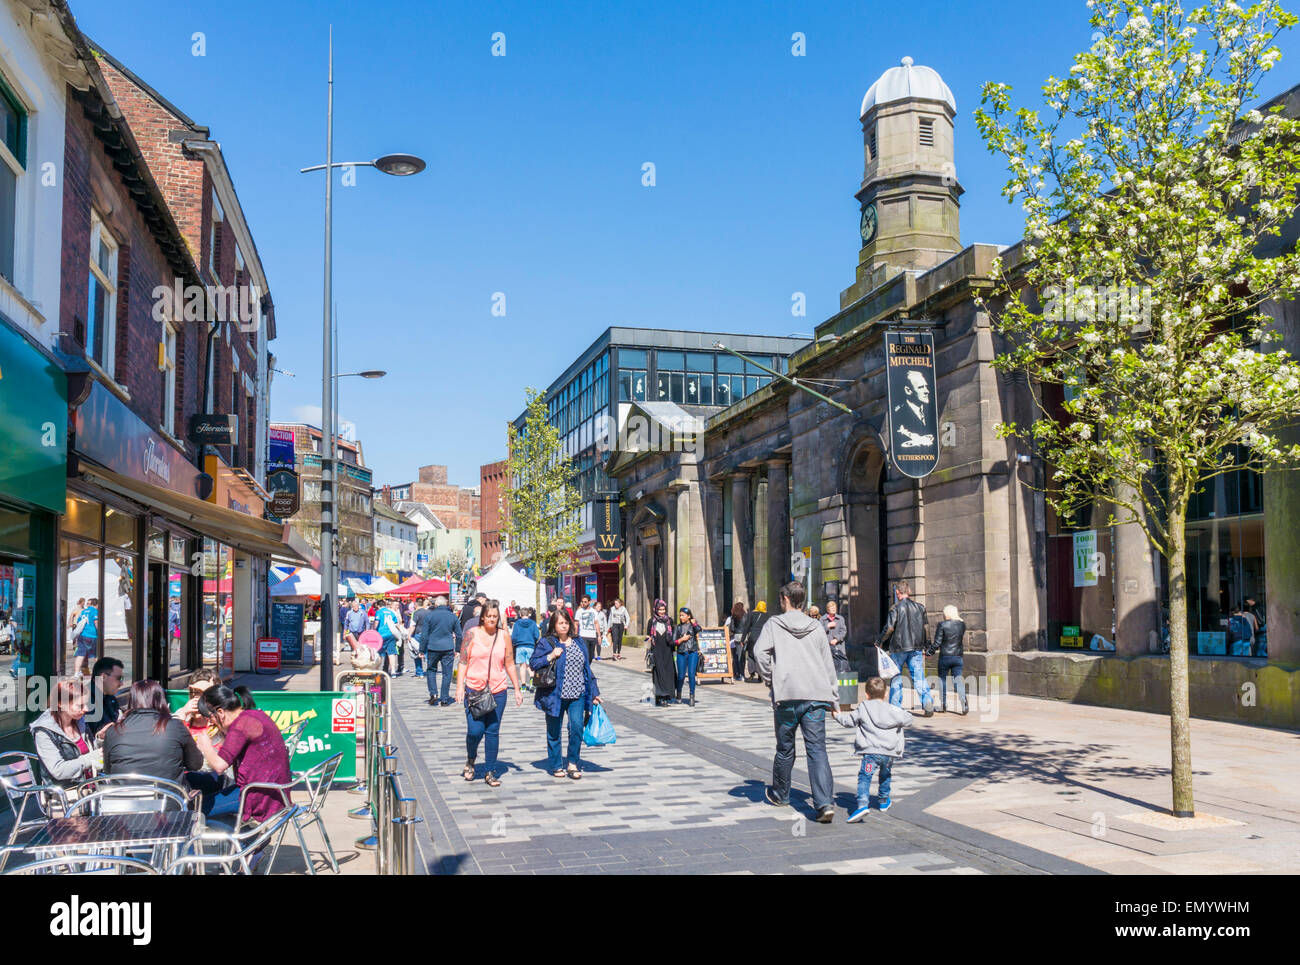 City Centre Stoke on Trent Staffordshire England GB UK EU Europe - Stock Image